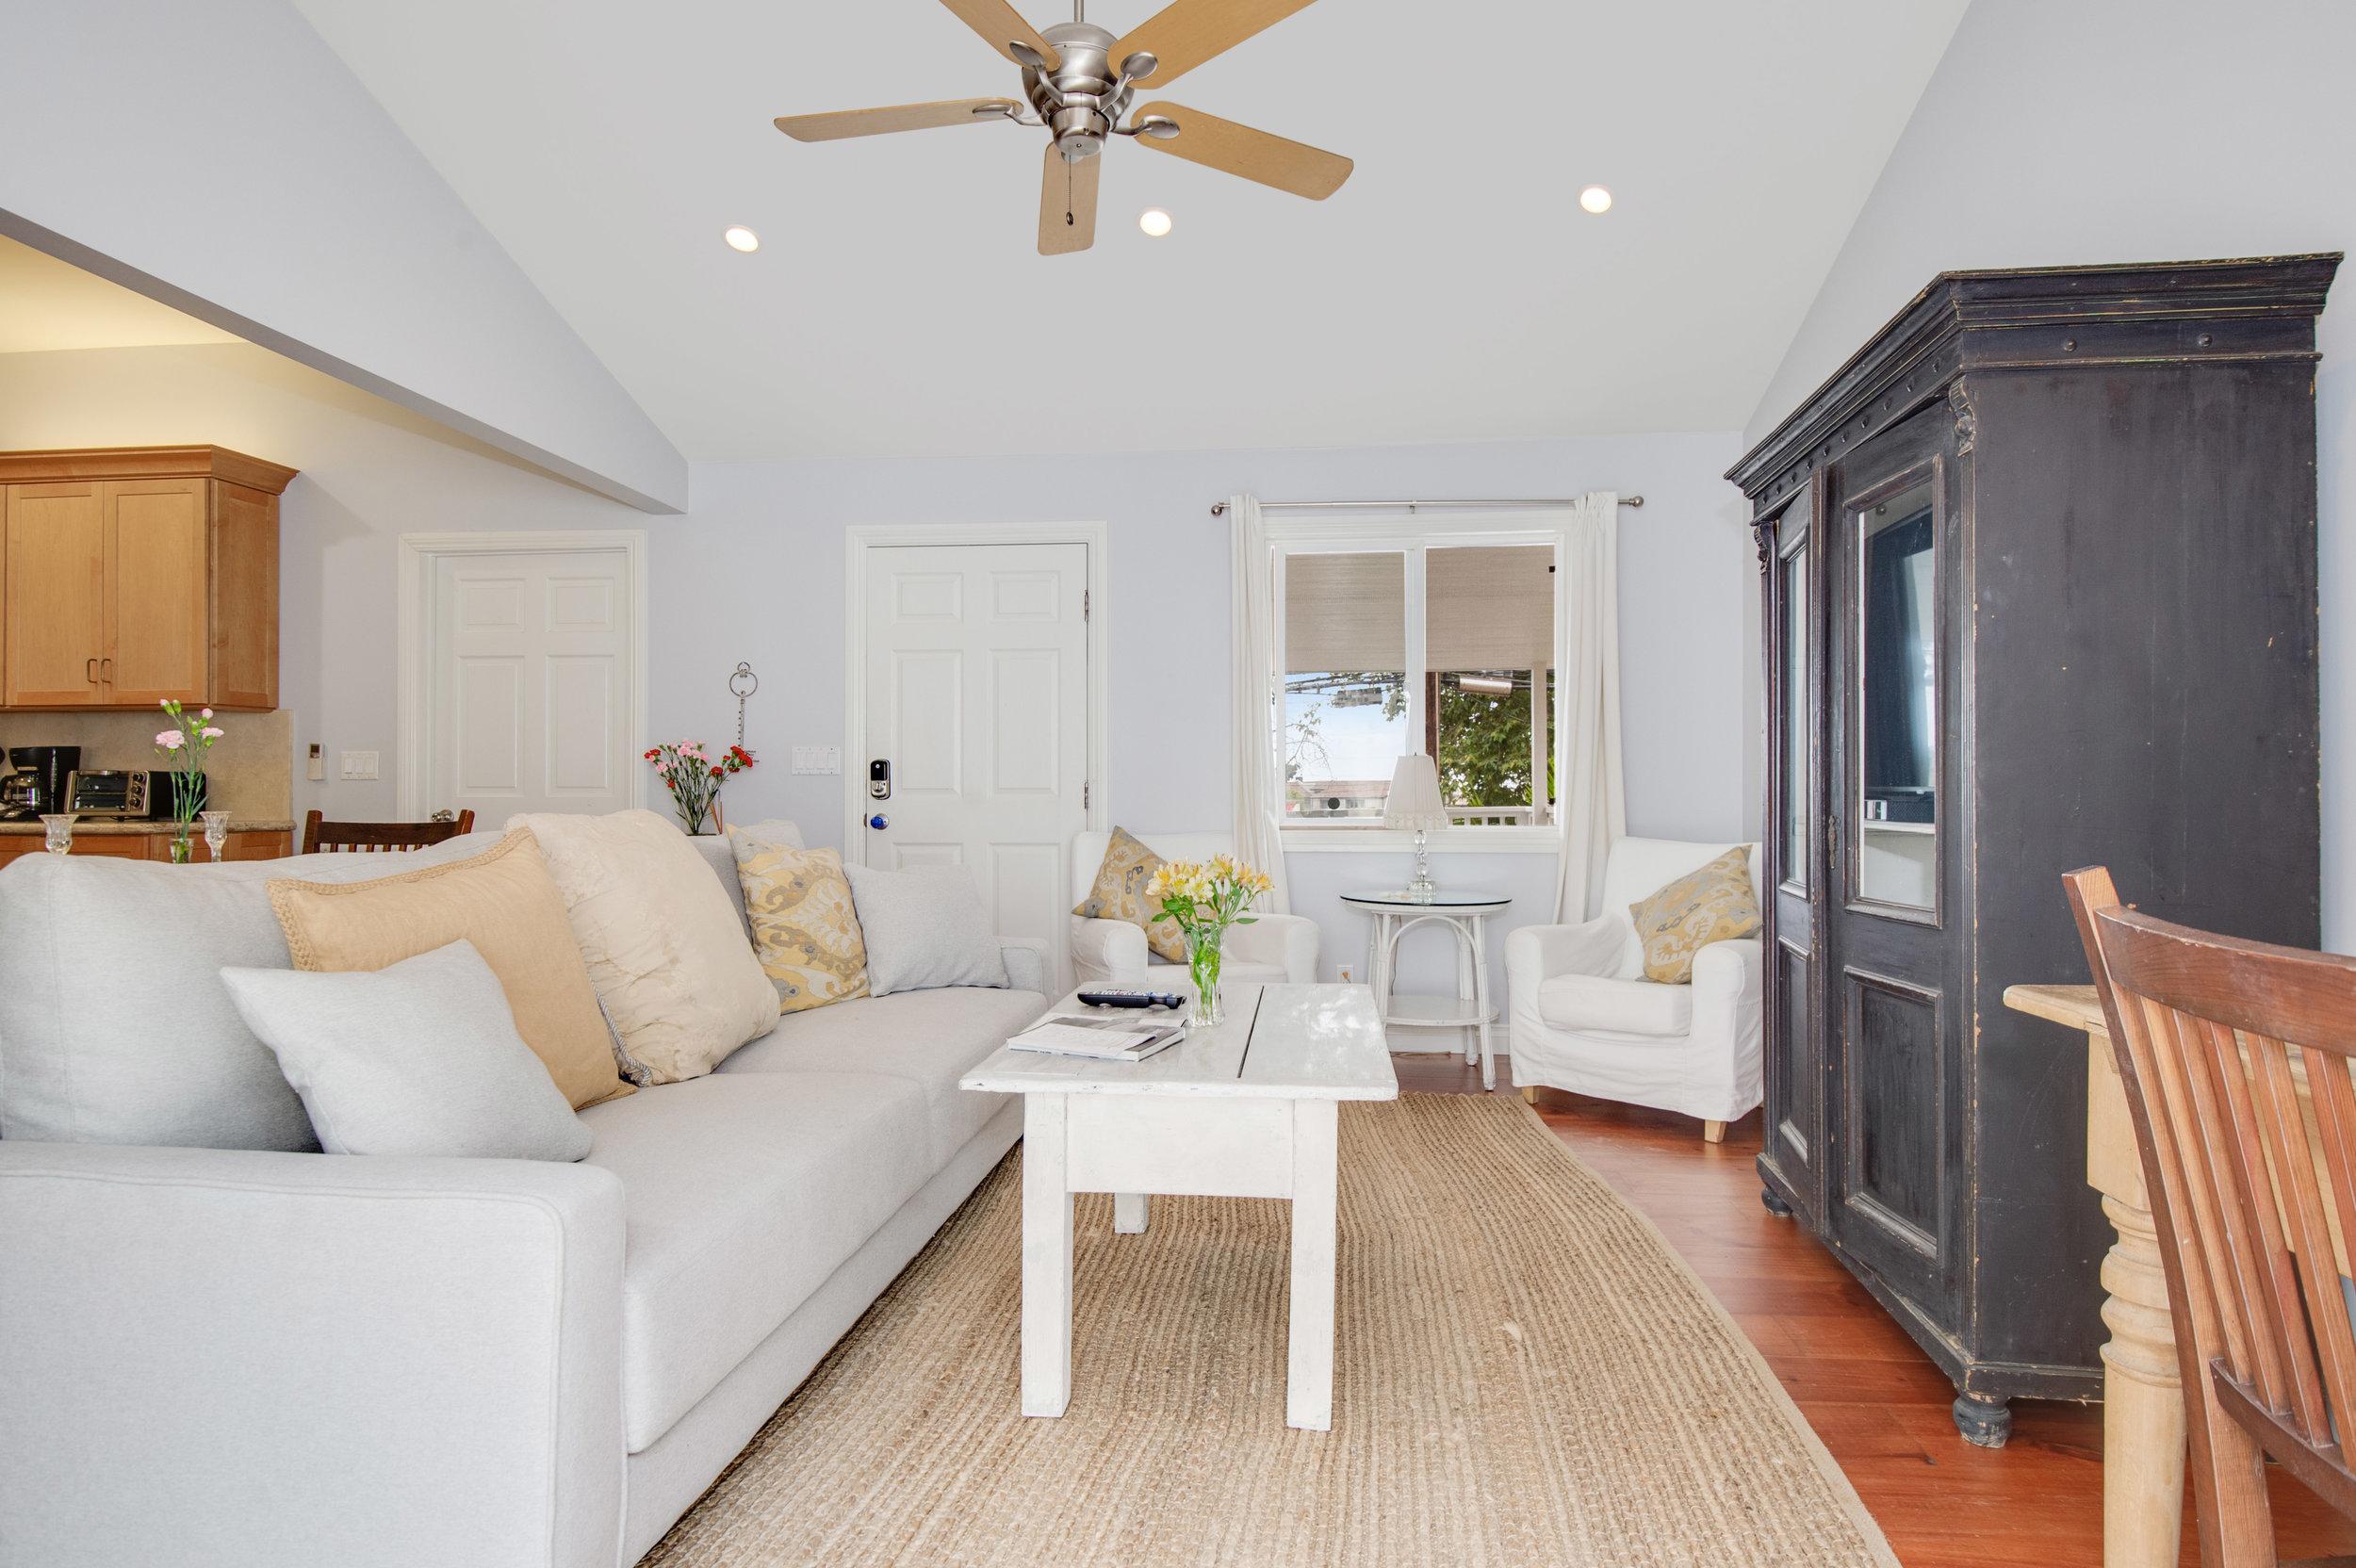 004 Living Room 3950 Las Flores For Sale Lease The Malibu Life Team Luxury Real Estate.jpg